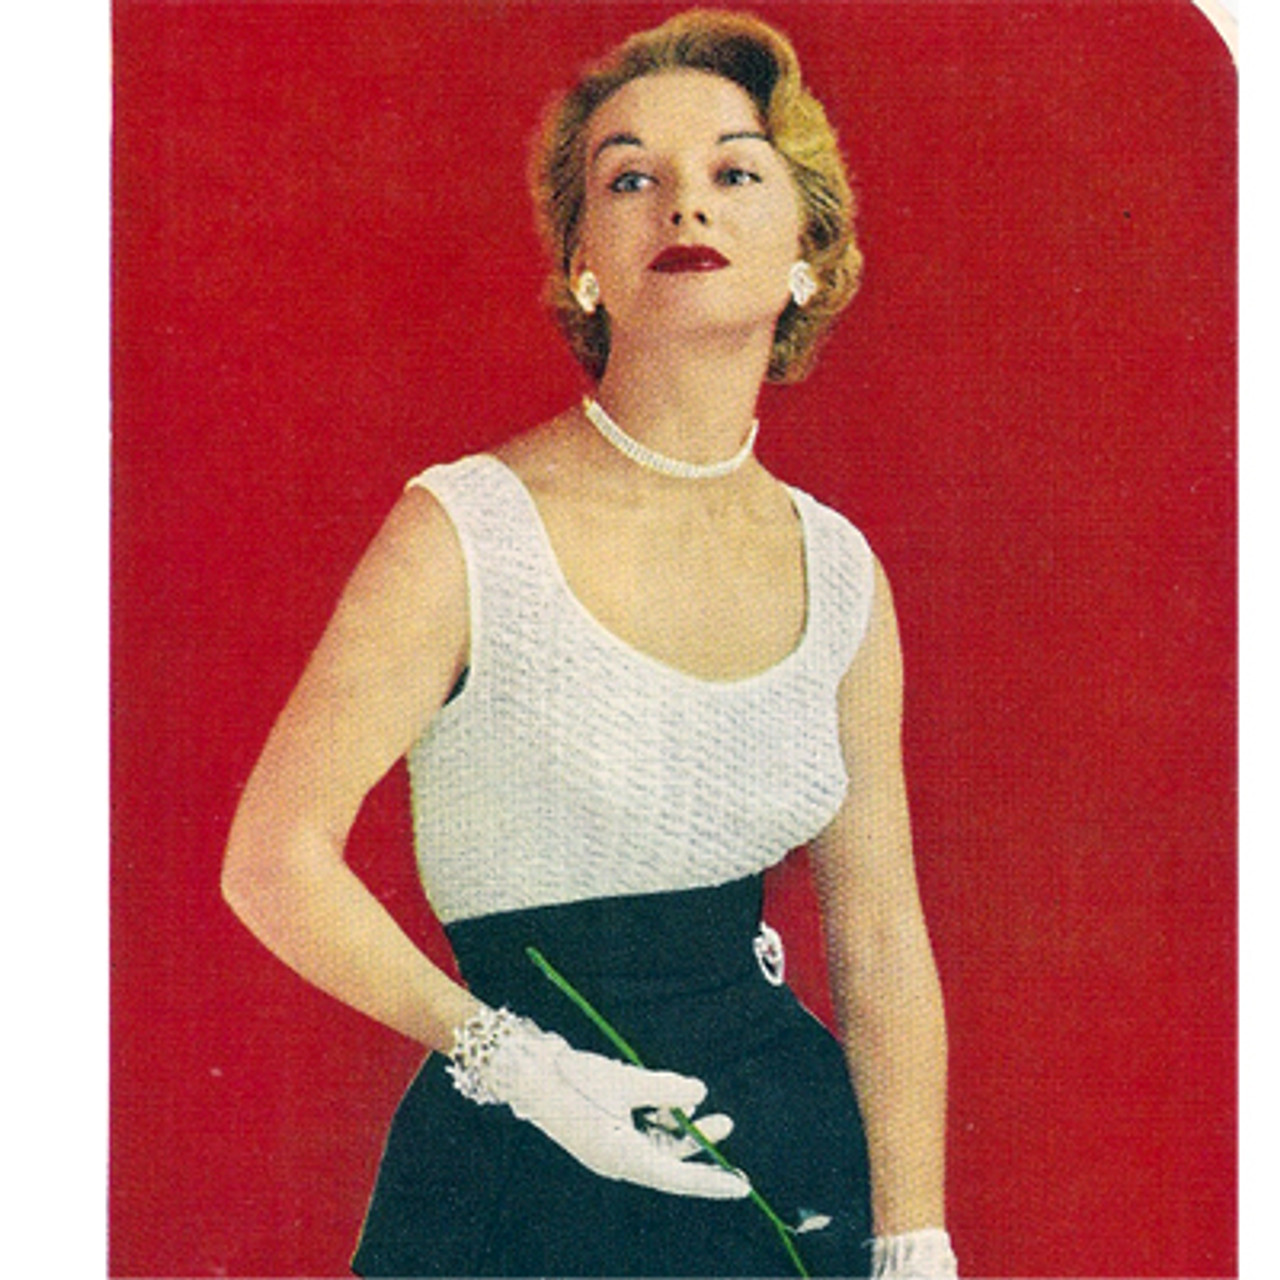 Crochet Sleeveless Evening Blouse Pattern